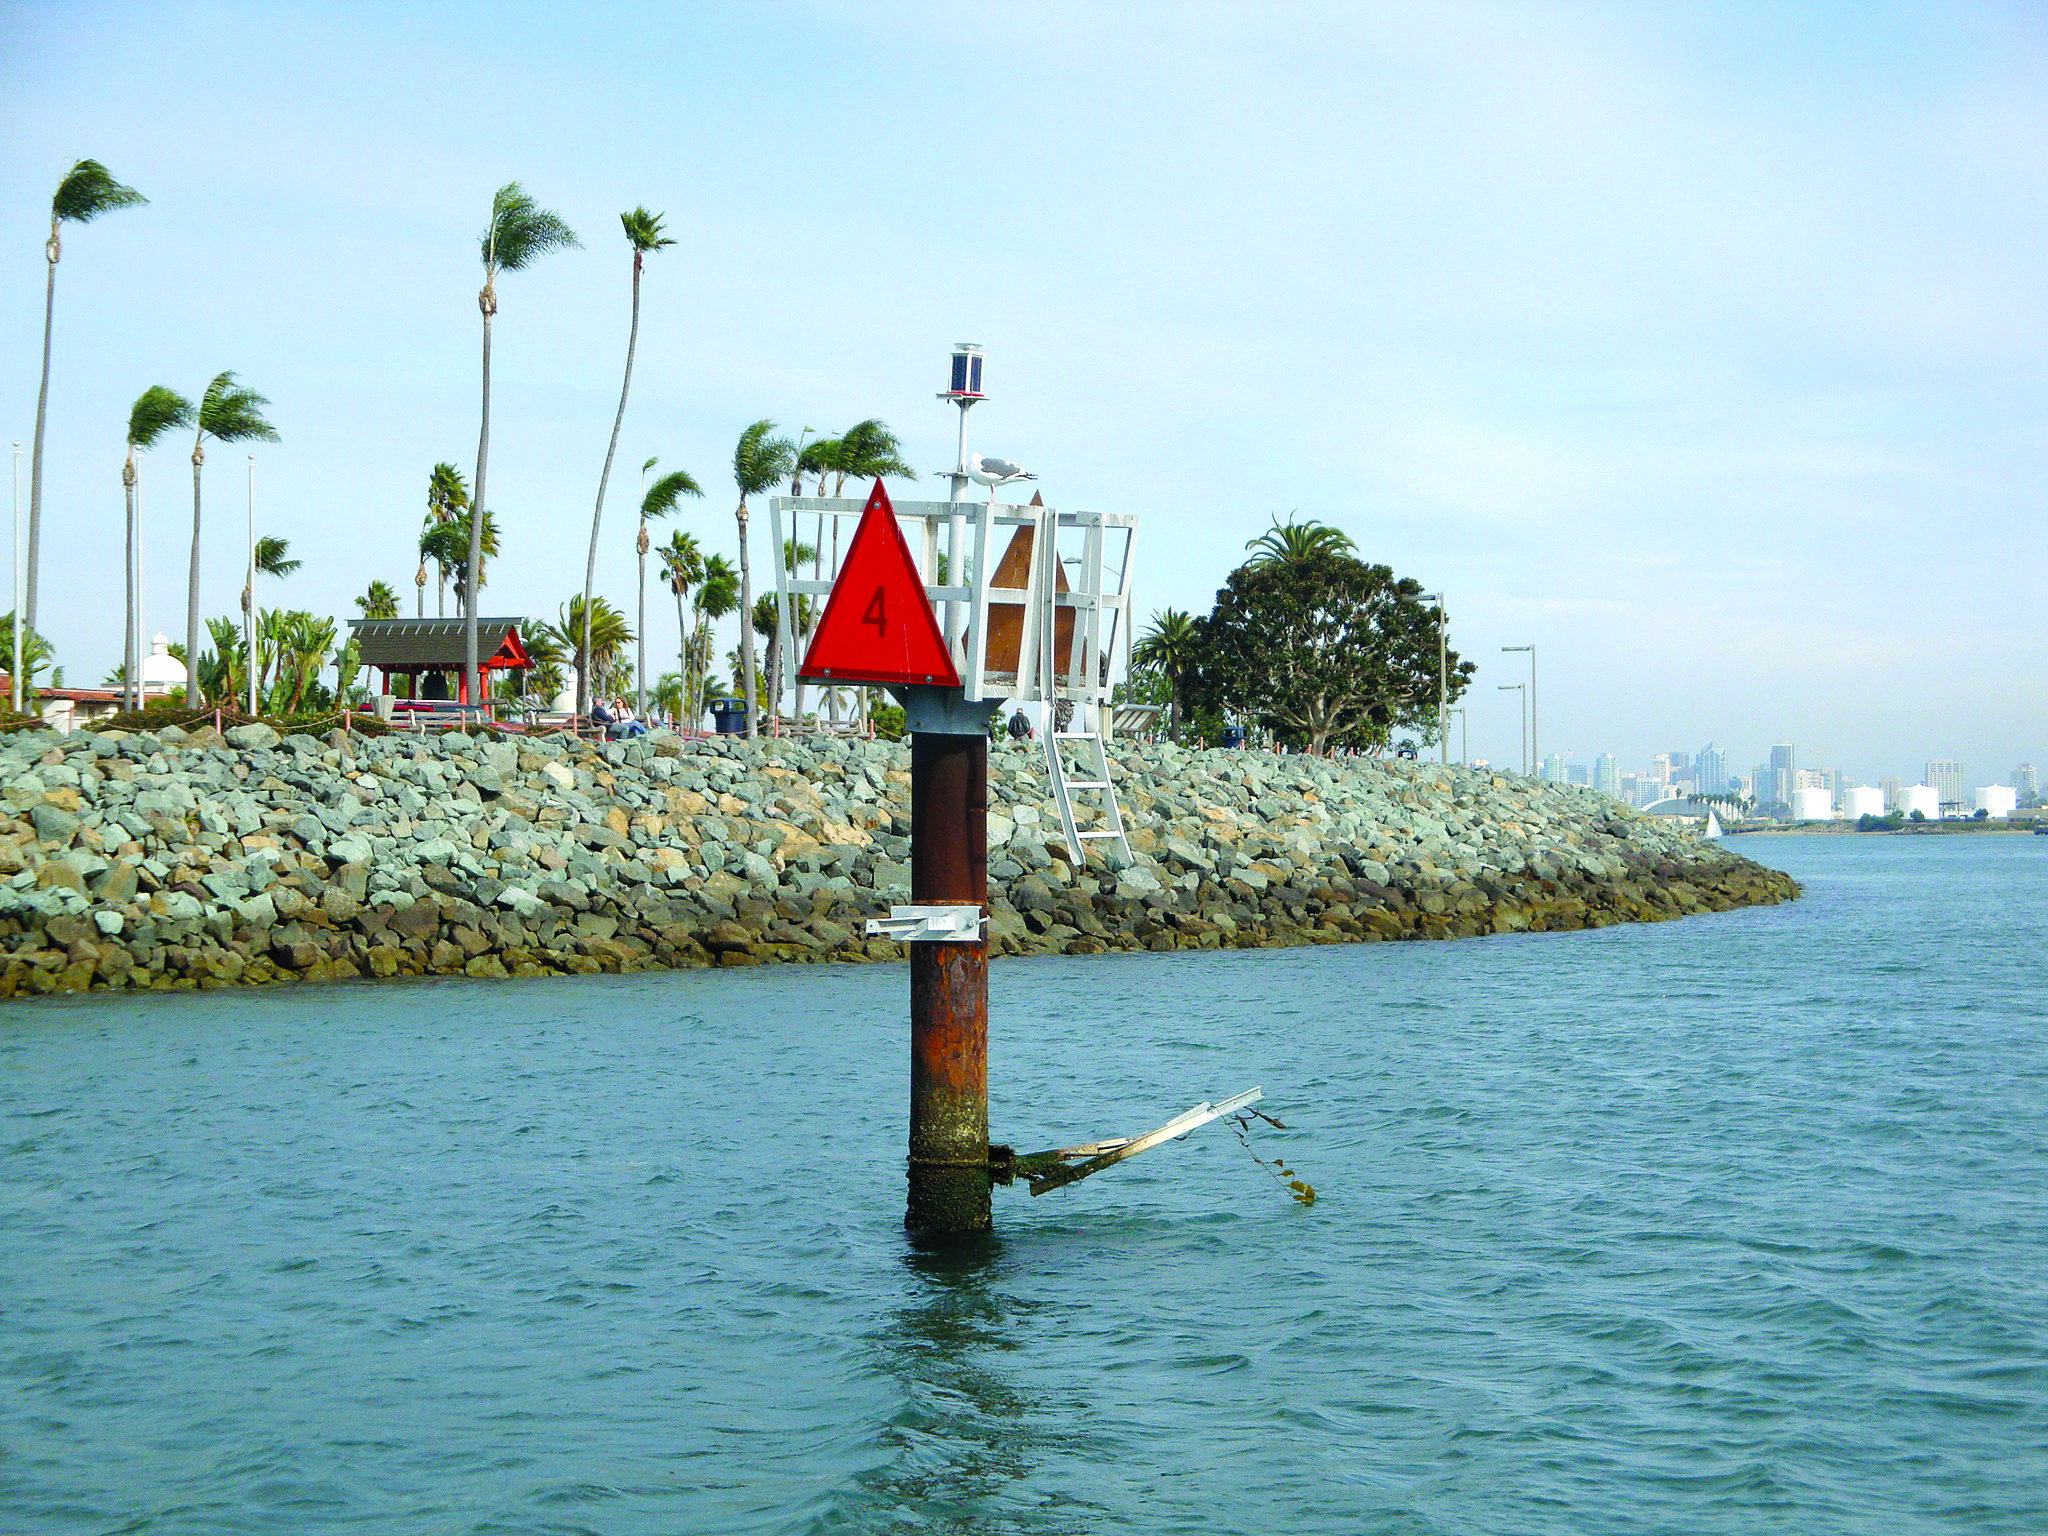 Coast Guard Warns of Damaged San Diego Navigation Marker